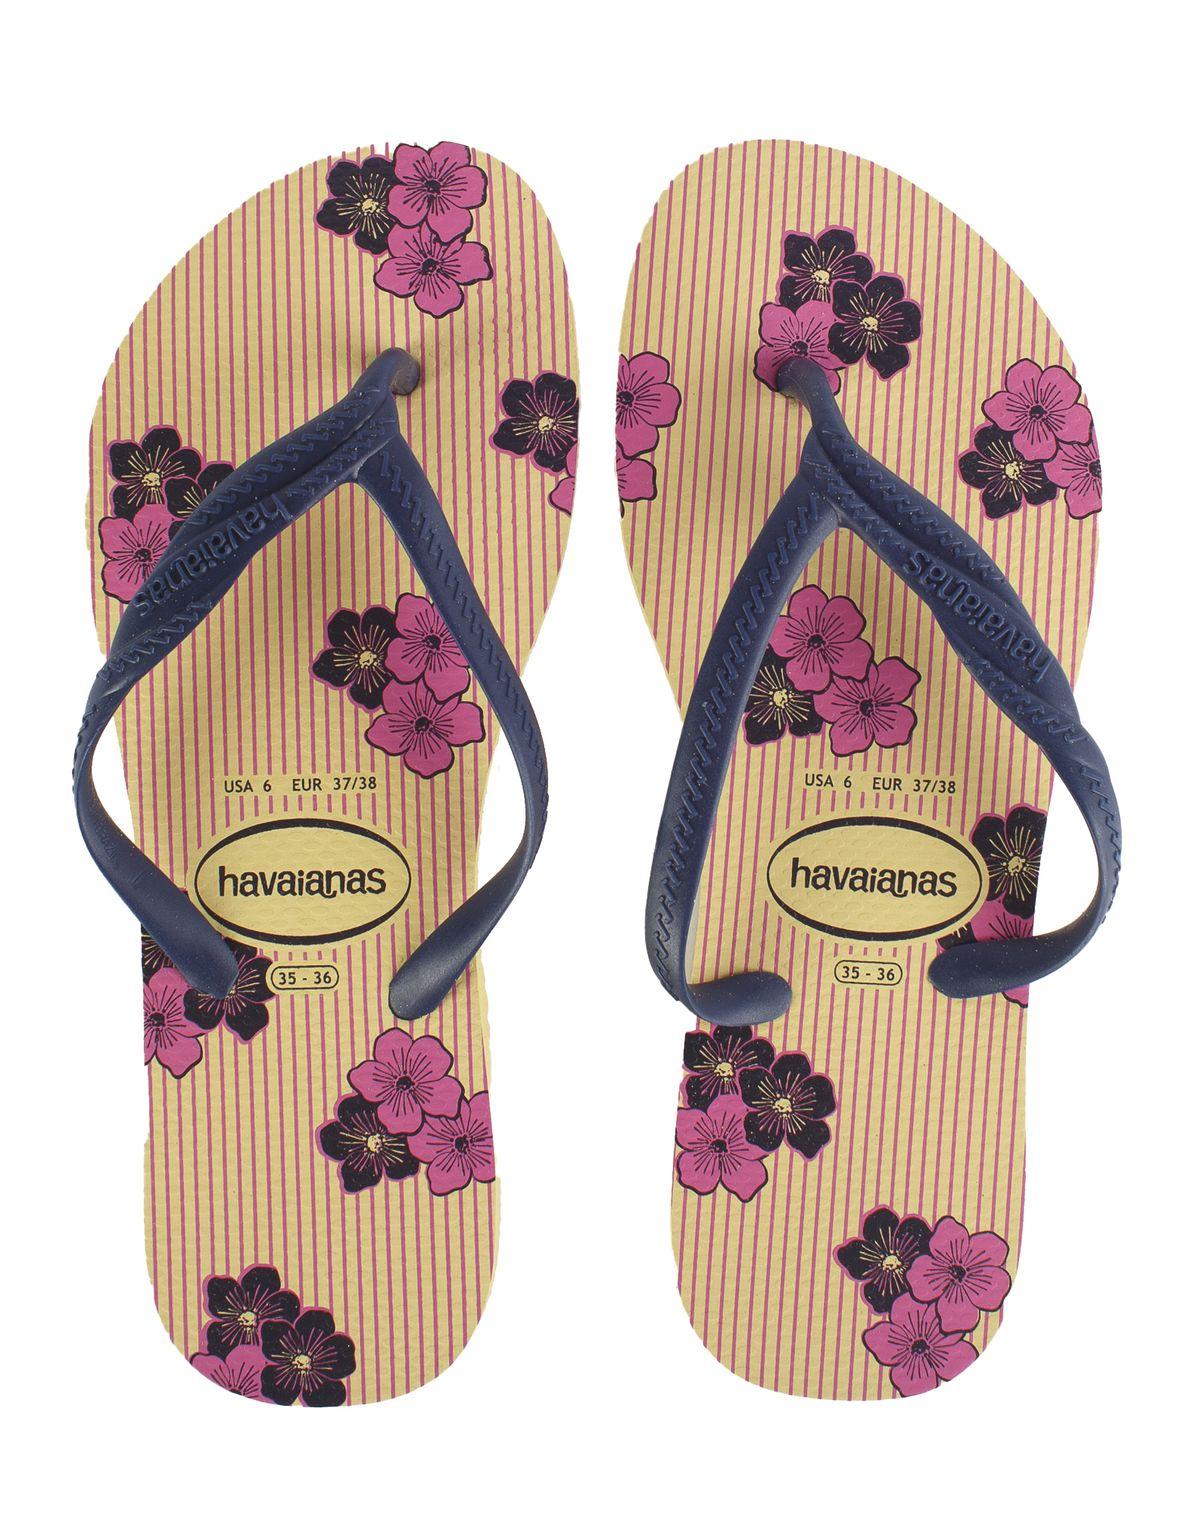 558925010-chinelo-havaianas-feminina-fantasia-romantica-amarelo-limao-35-6-f1f